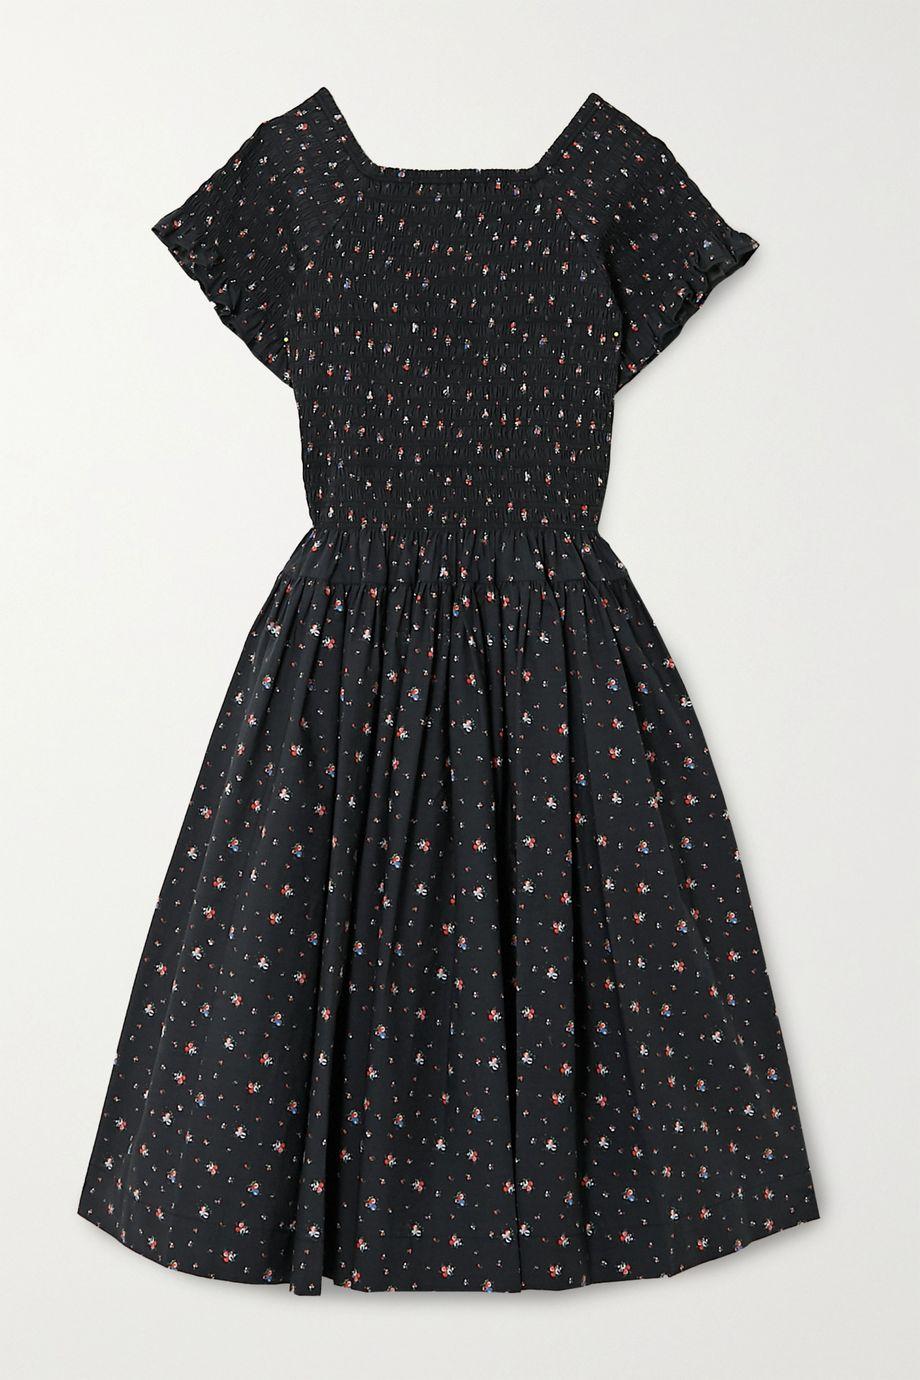 Molly Goddard Tilly shirred pleated floral-print cotton-poplin midi dress